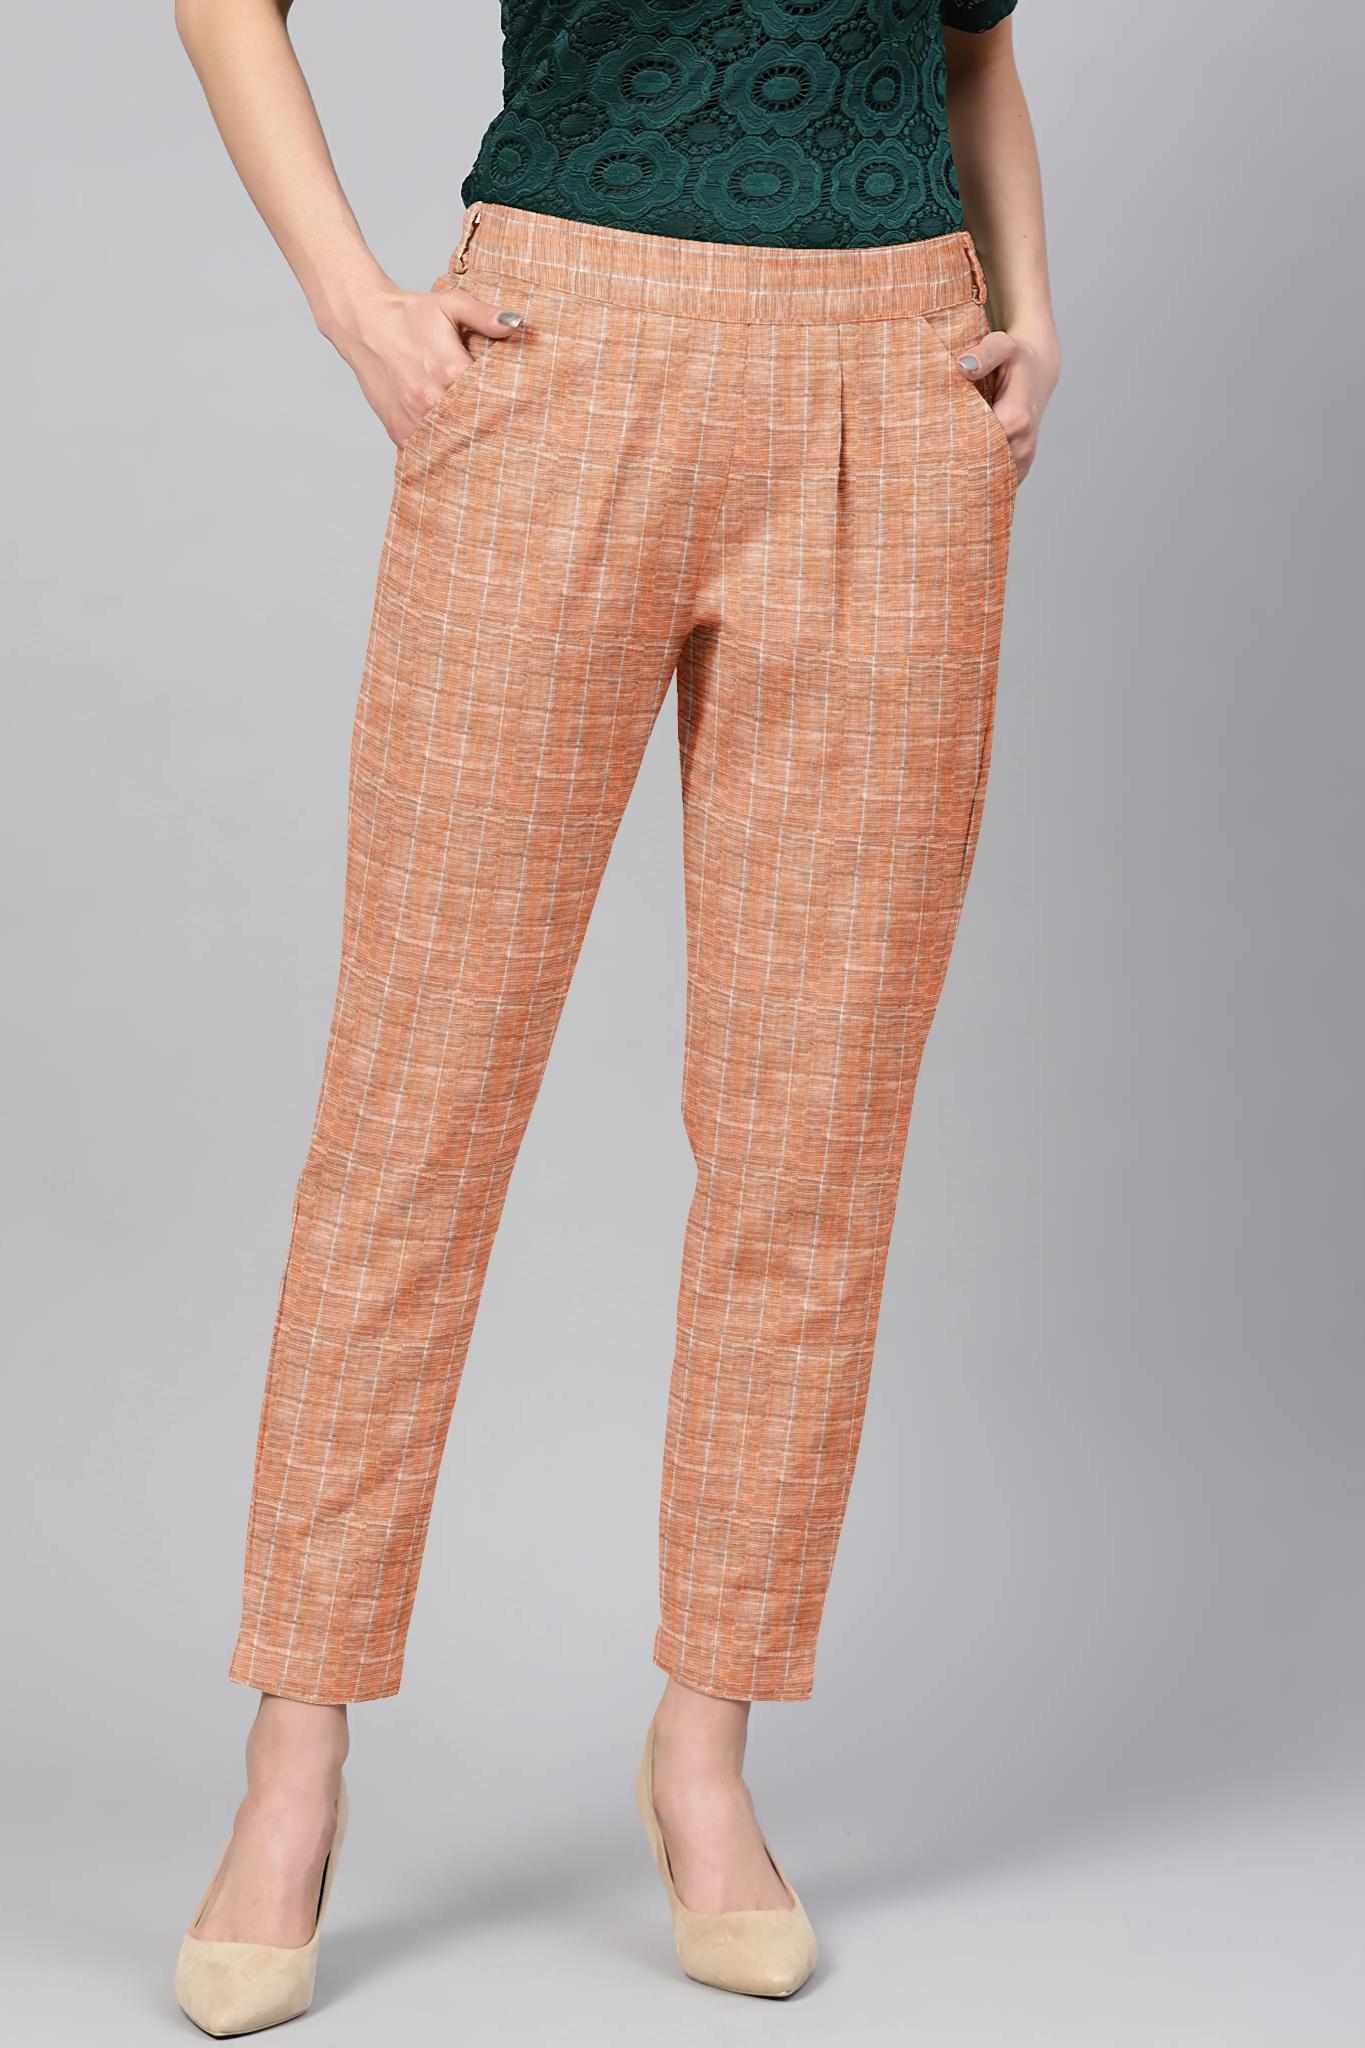 /home/customer/www/fabartcraft.com/public_html/uploadshttps://www.shopolics.com/uploads/images/medium/Brown-White-Cotton-Check-Regular-Fit-Solid-Trouser-36057.jpg